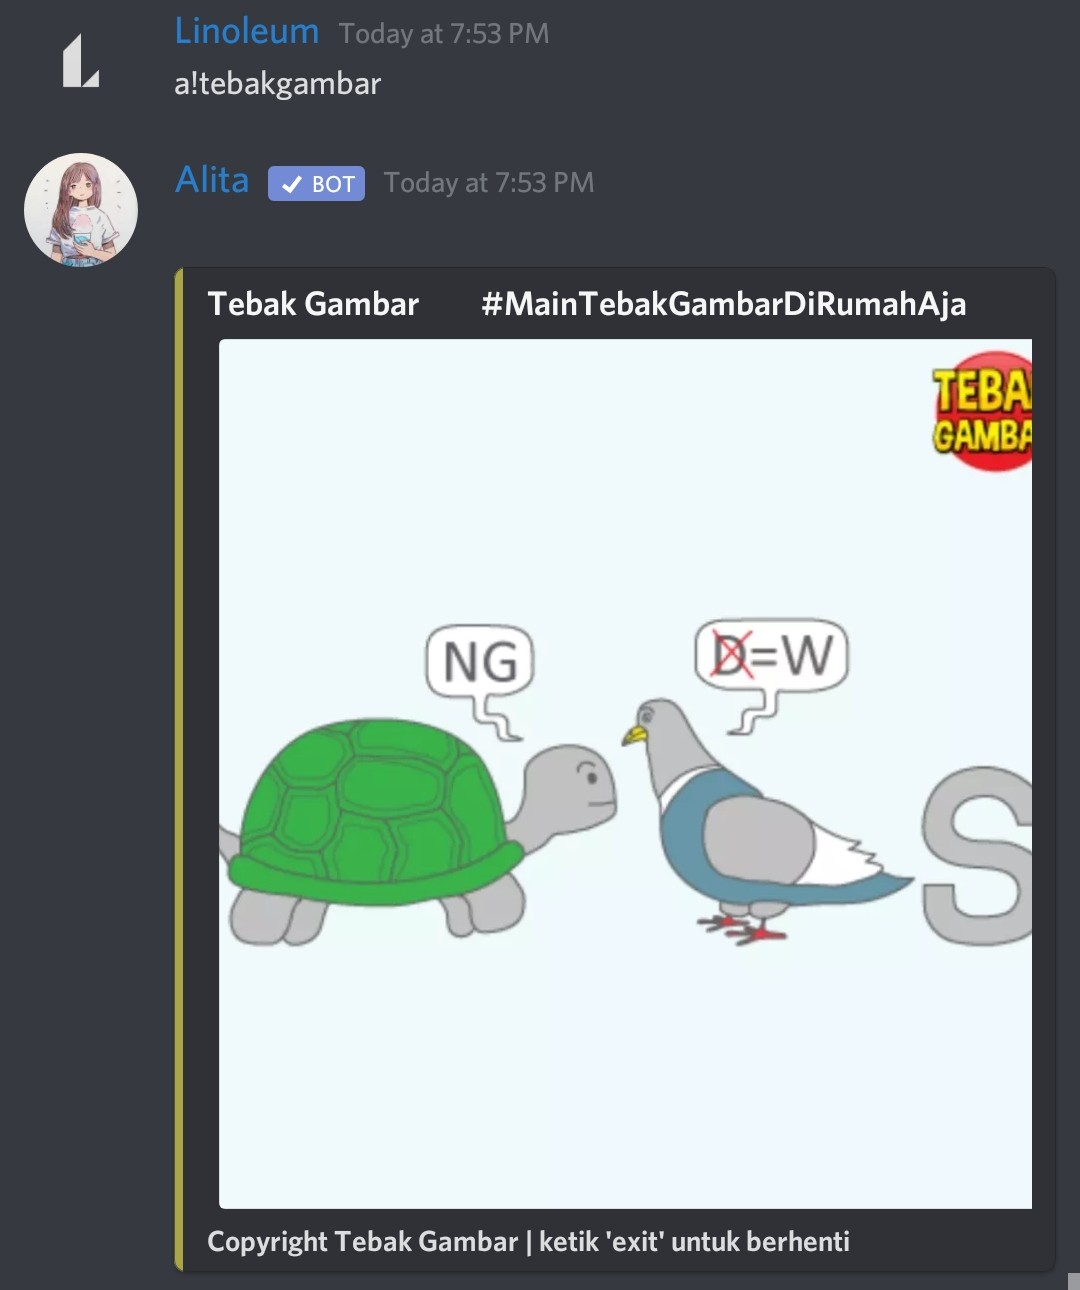 Tebak Gambar Alita Bot Discord Indonesia